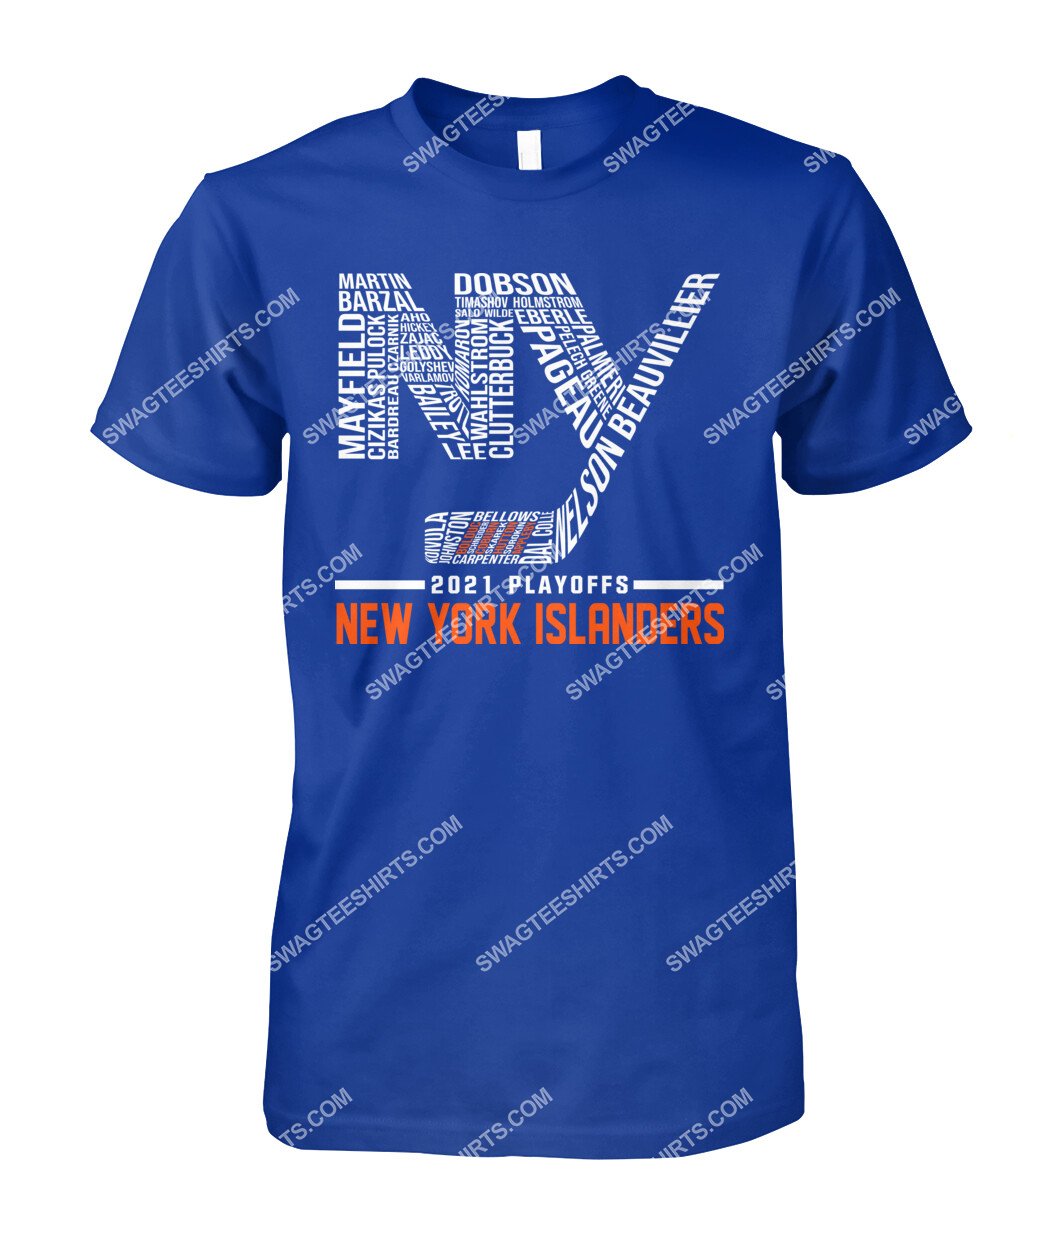 2021 playoffs new york islanders national hockey league tshirt 1